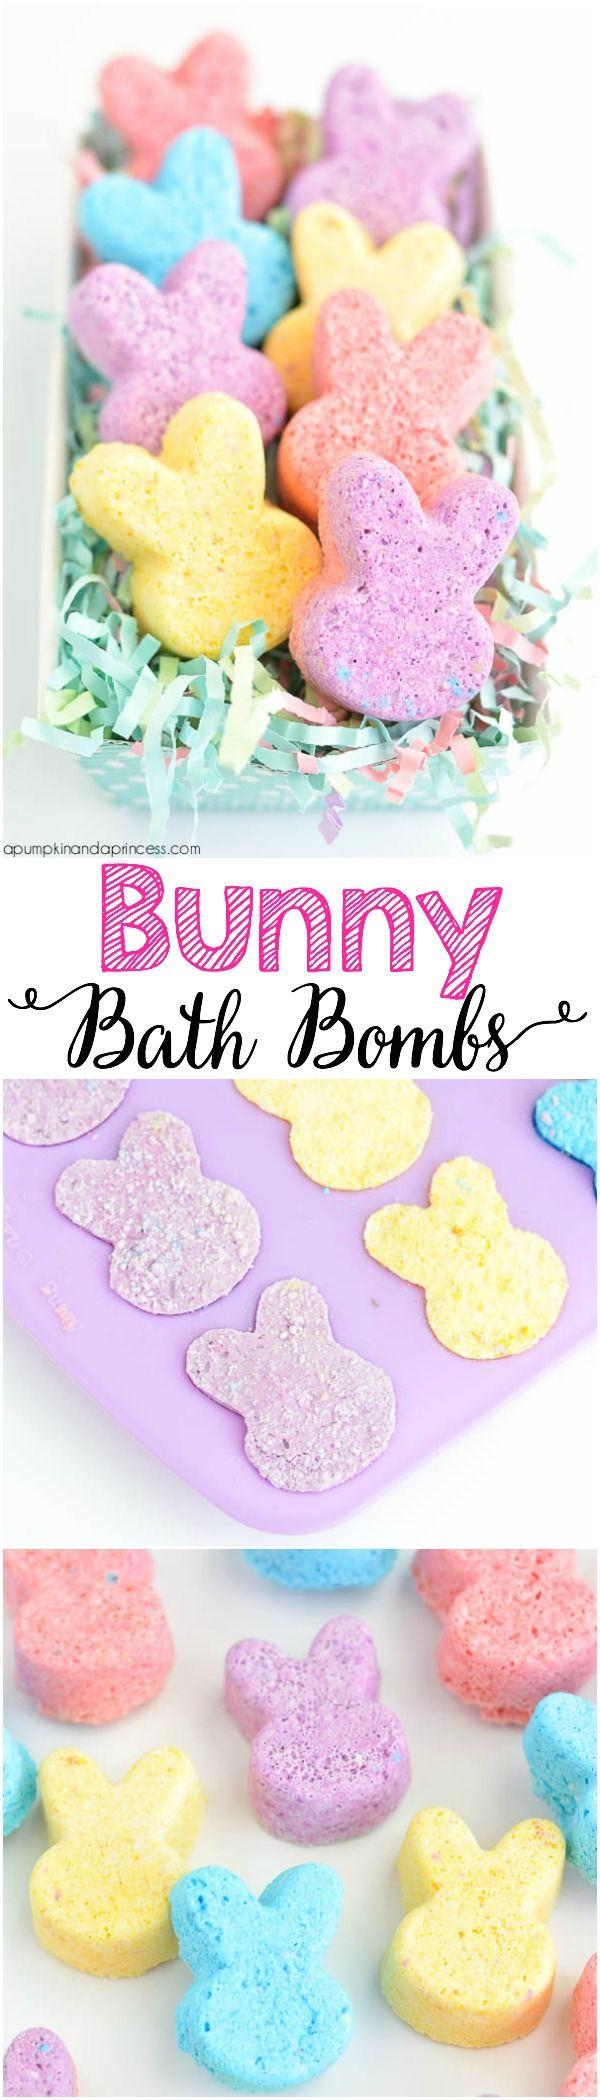 DIY Bunny Bath Bombs